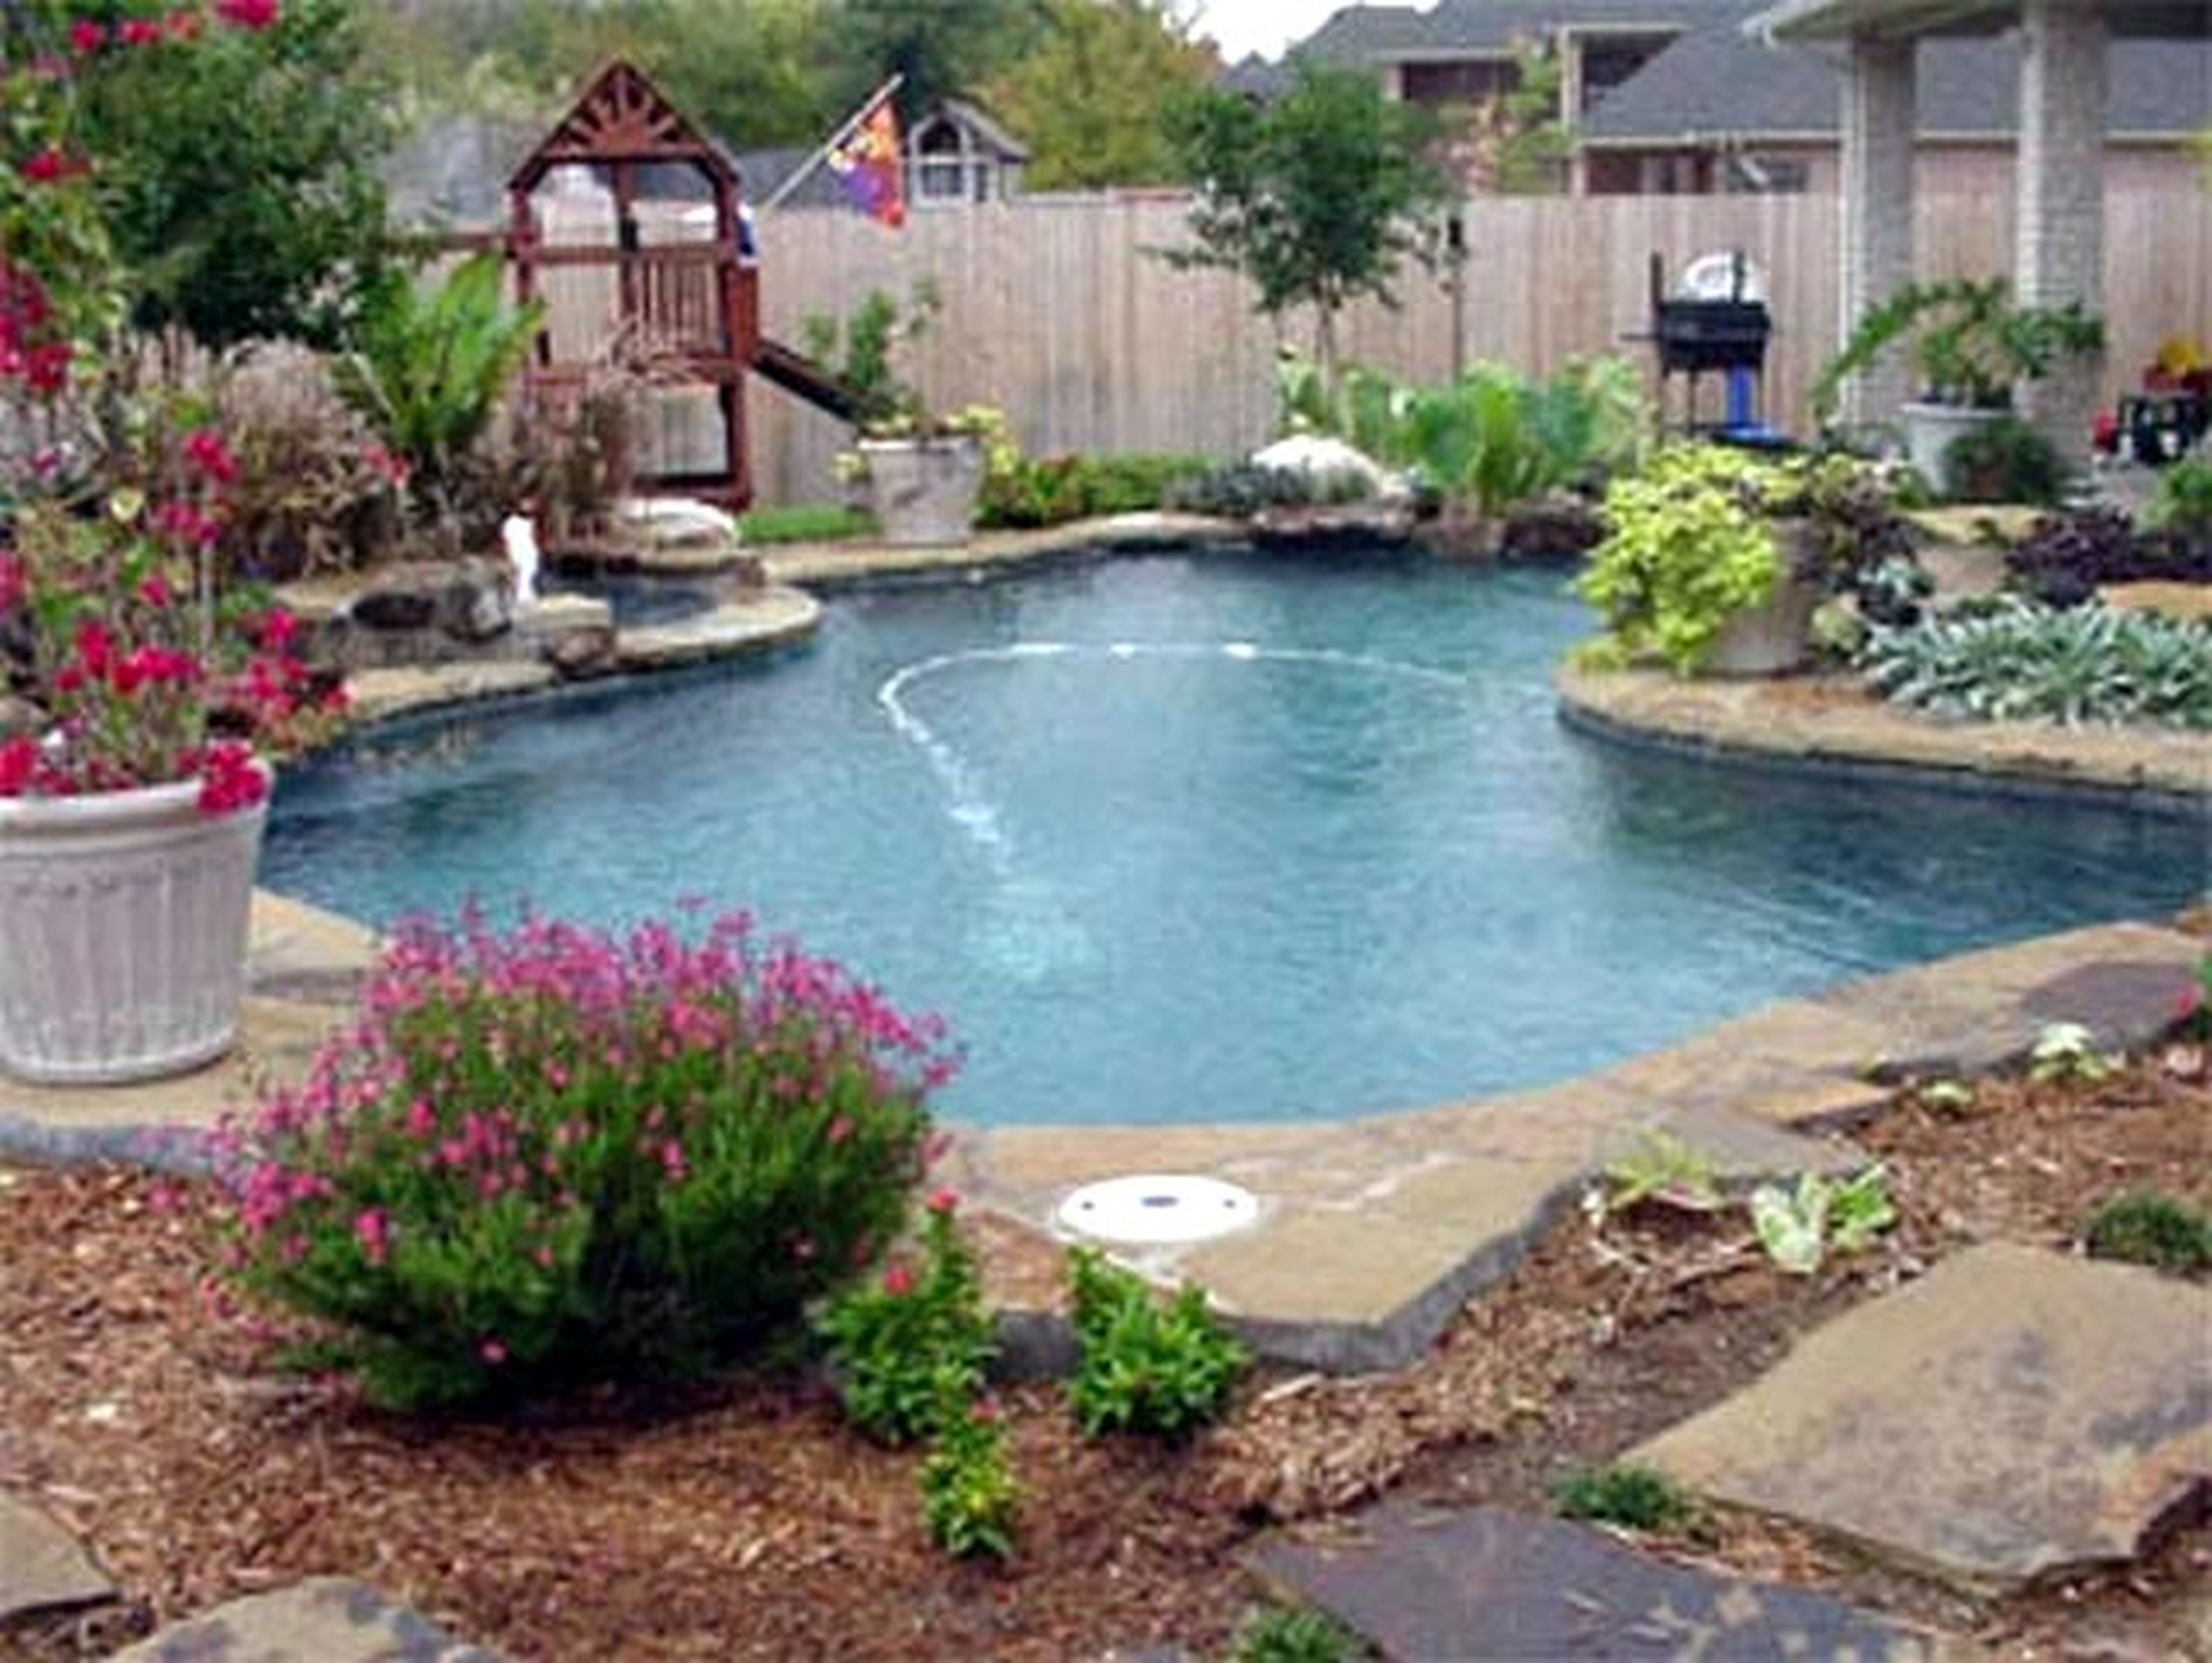 10 Rock Garden Patio Ideas Elegant And Also Attractive Backyard Pool Landscaping Pool Landscaping Garden Pool Design